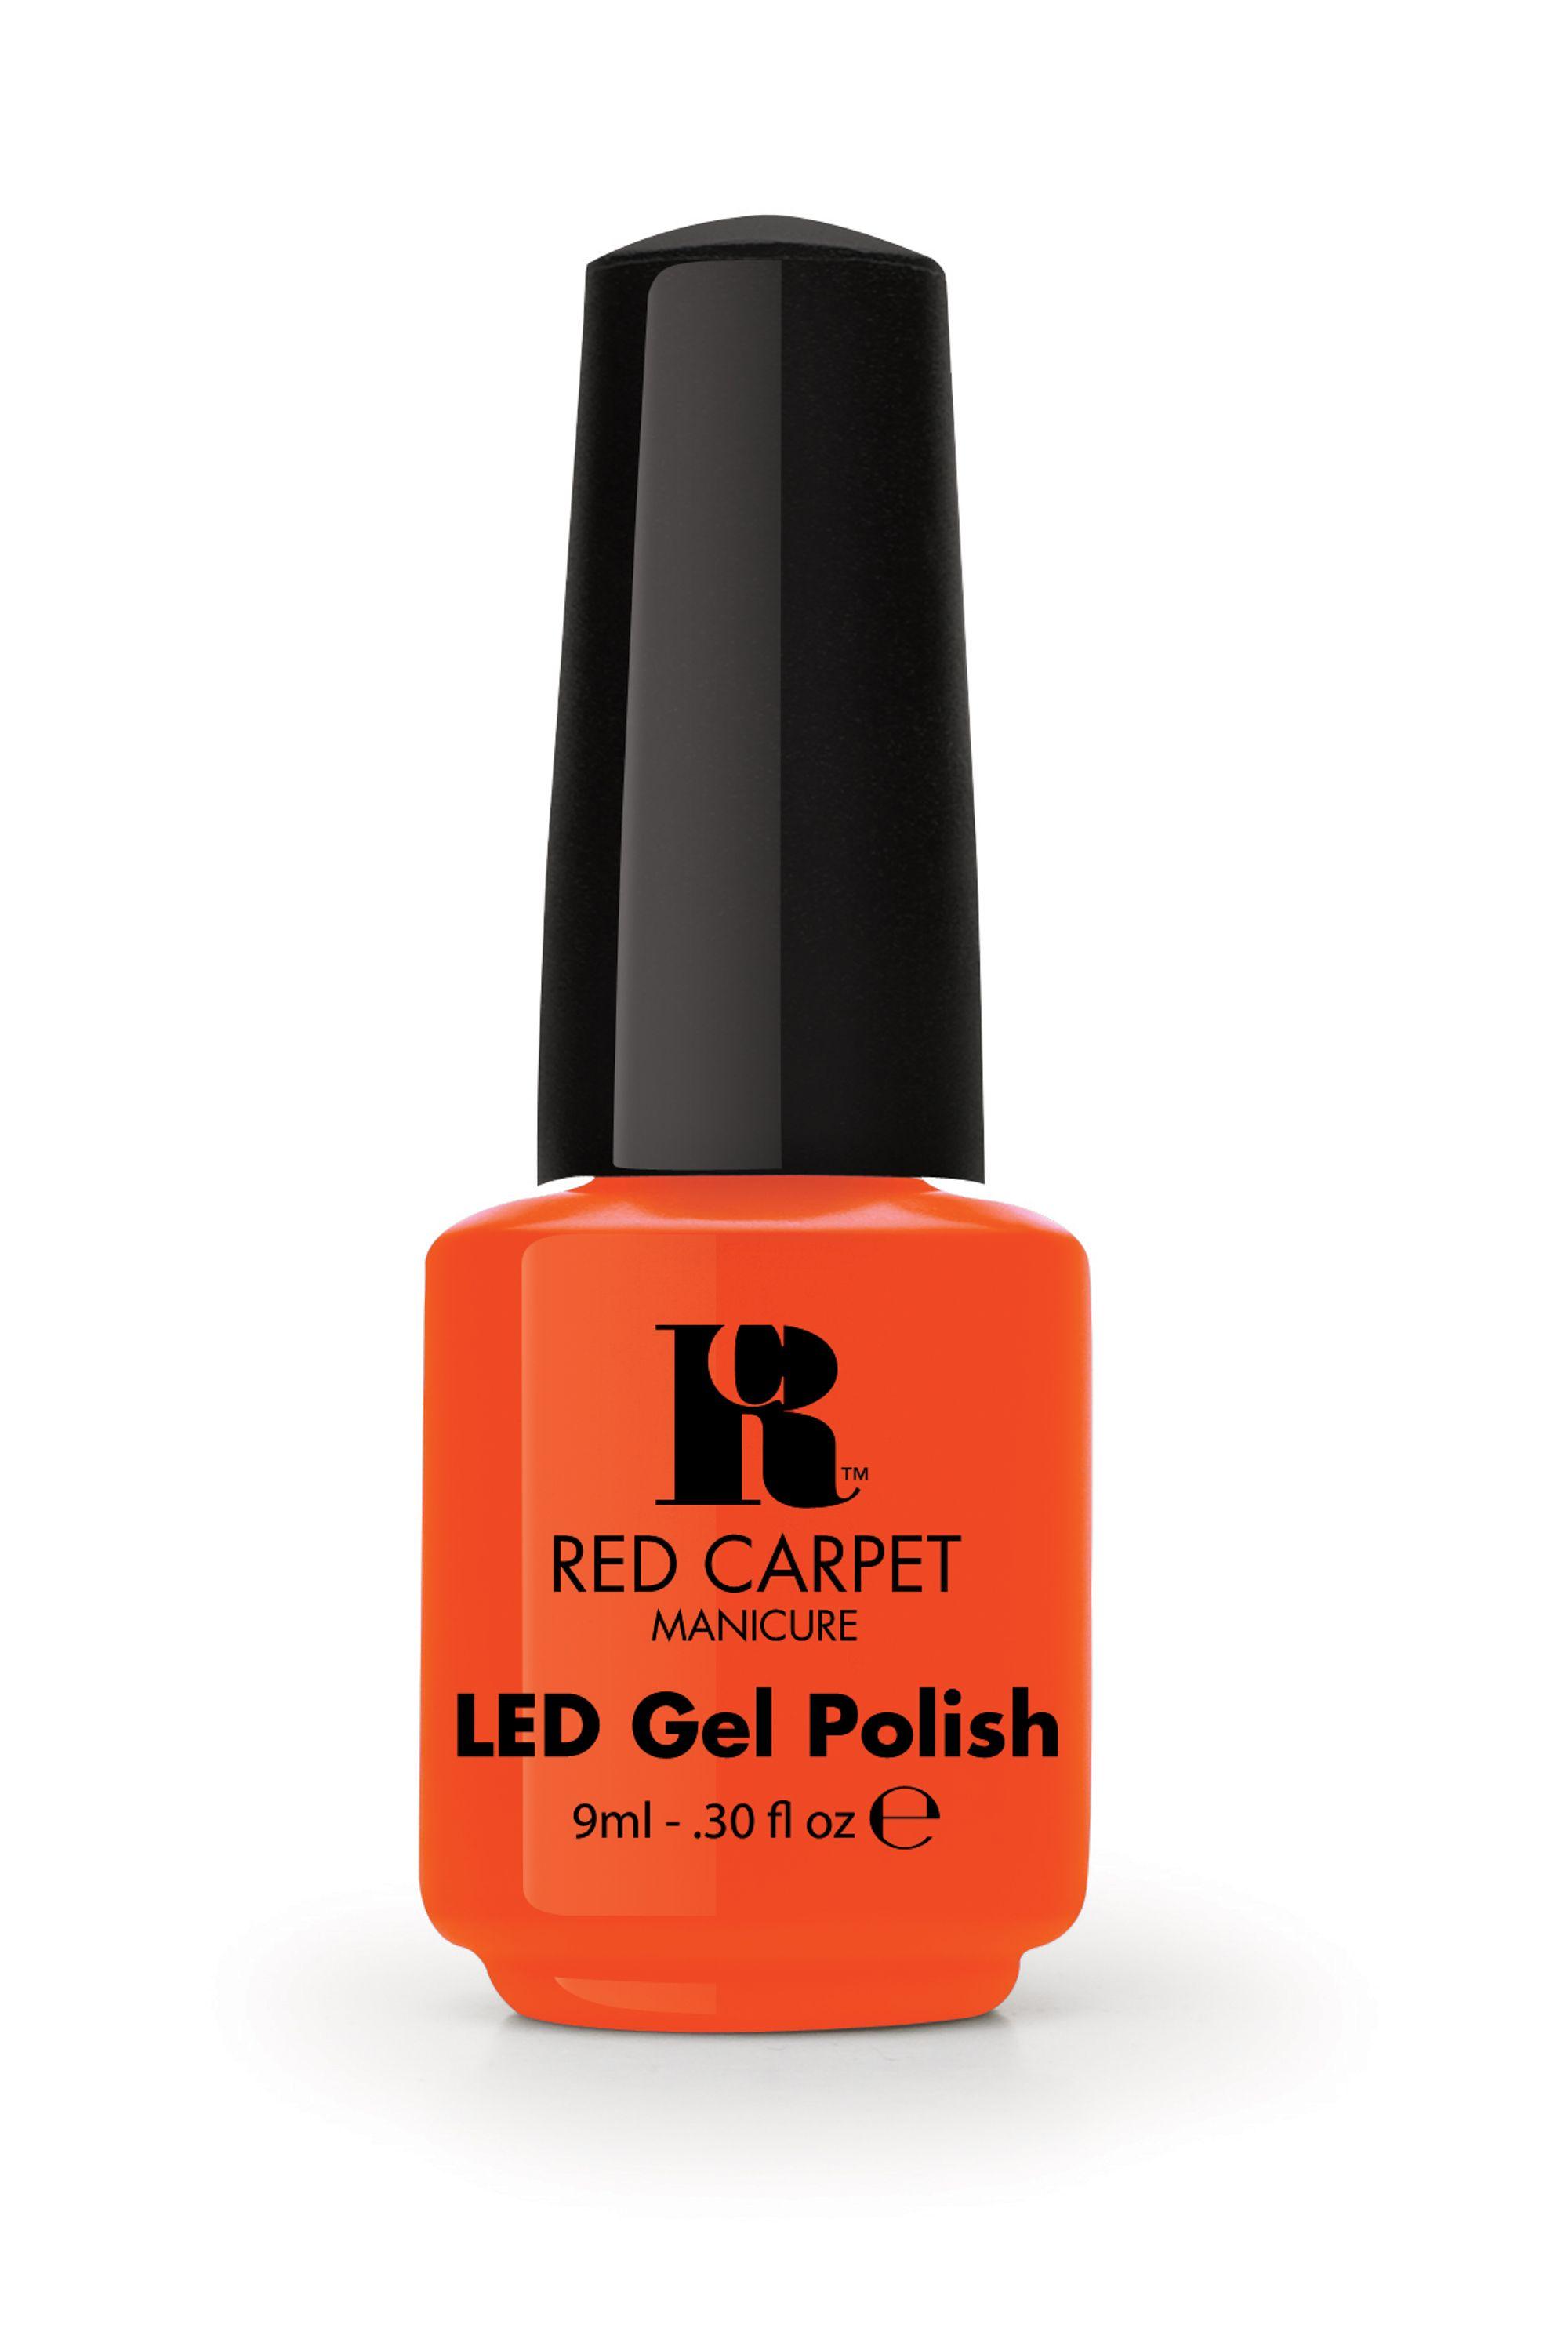 Red Carpet Manicure Tangerine On The Rocks Gel Polish Redcarpetmanicure Gelpolish Nails Orange